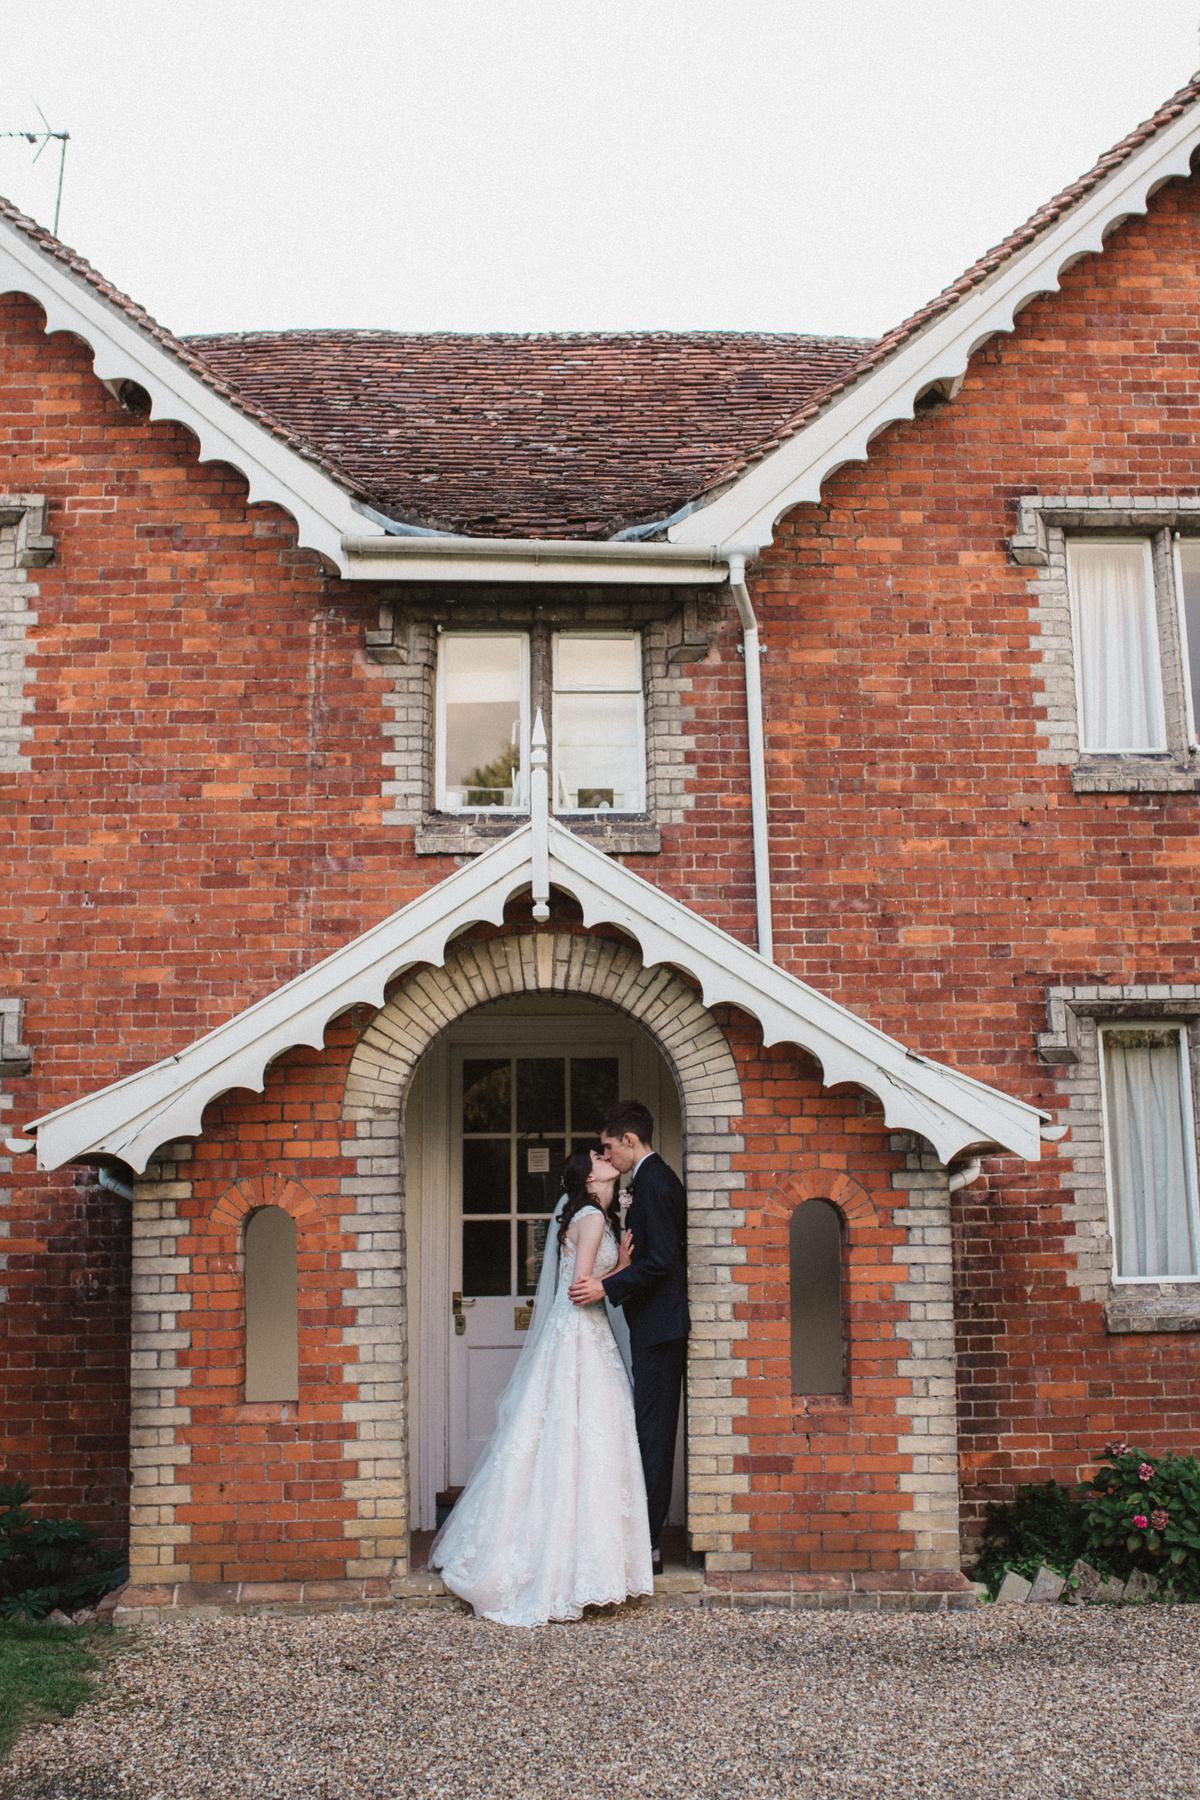 The farmhouse at HAUGHLEY PARK BARN WEDDING PHOTOGRAPHY